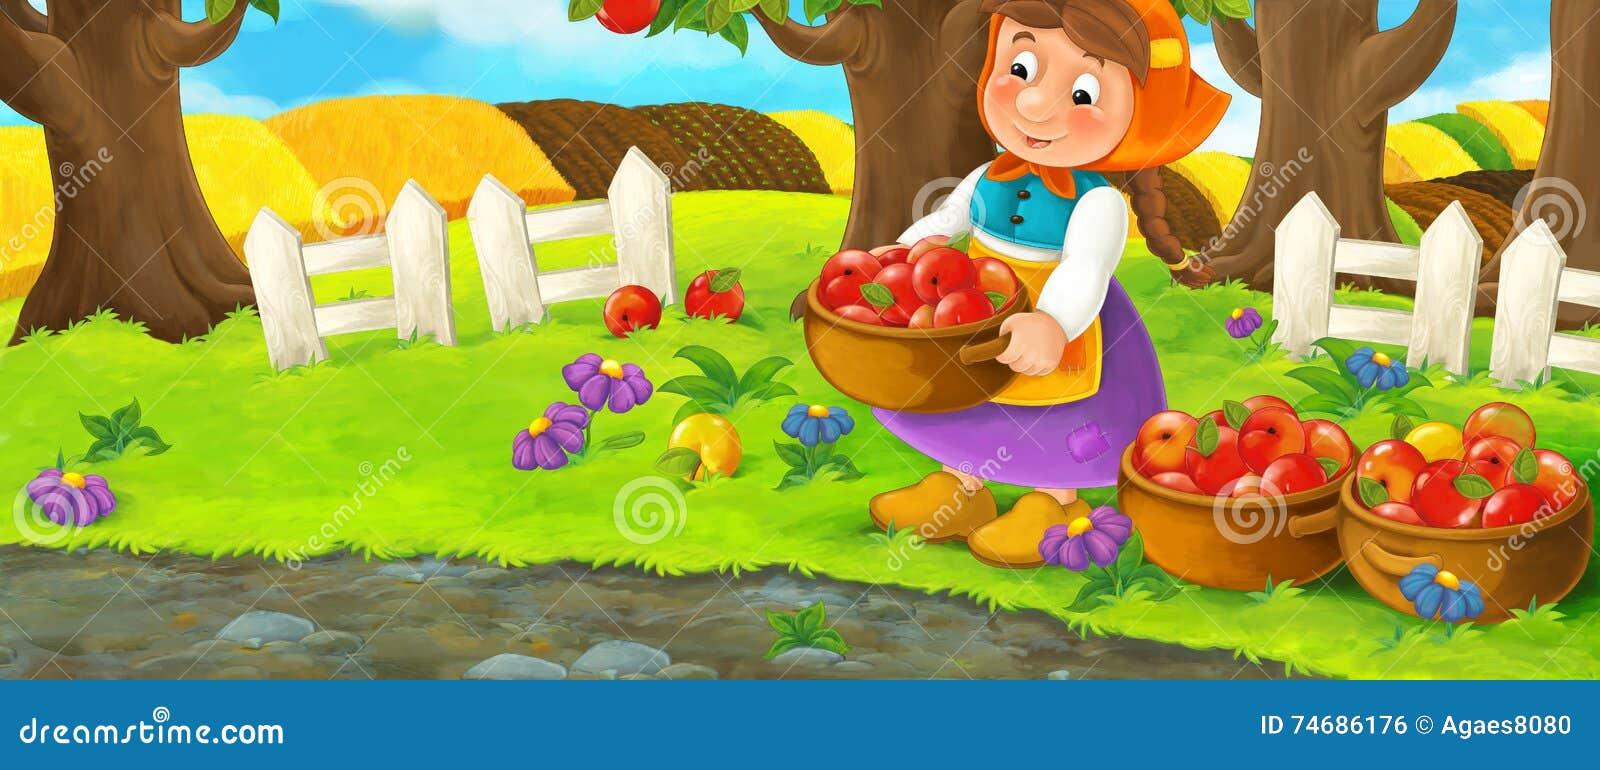 Beautiful garden cartoon - Cartoon Scene With Farm Woman In Garden During Beautiful Day Working Gathering Apples